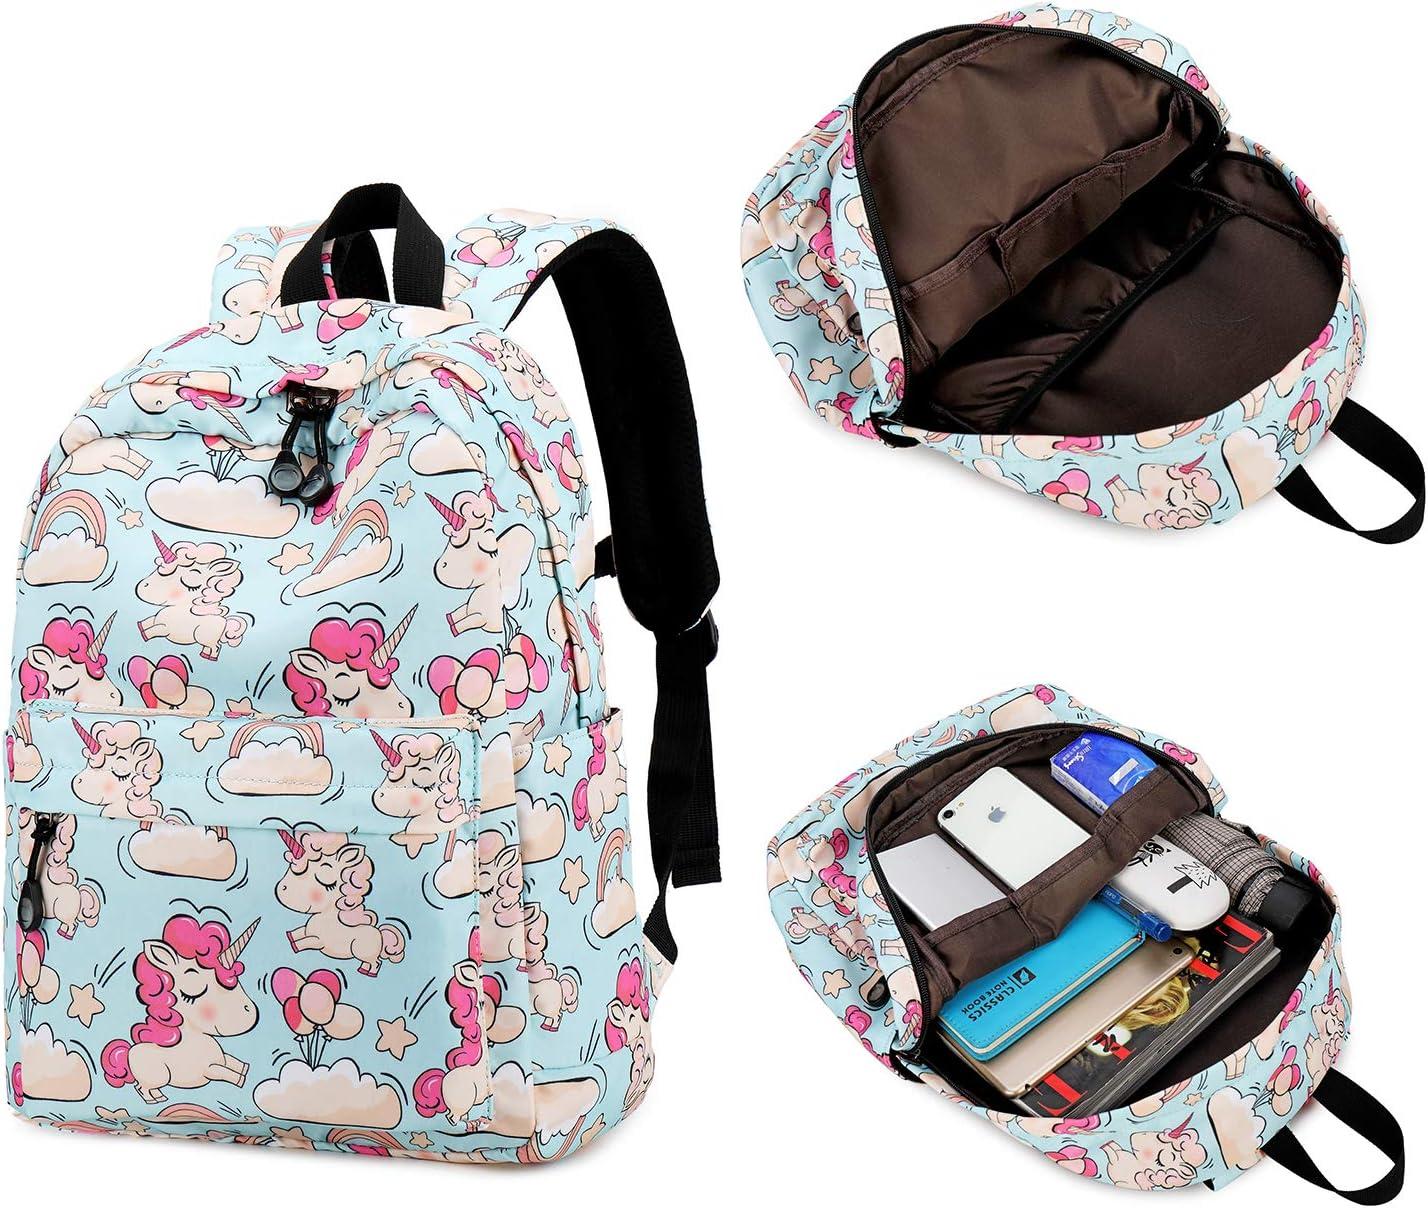 Kids Preschool Backpack Girls Boys Kindergarten Bookbag Toddler Backpacks Water Resistant Dinosaur-Black 0032-1